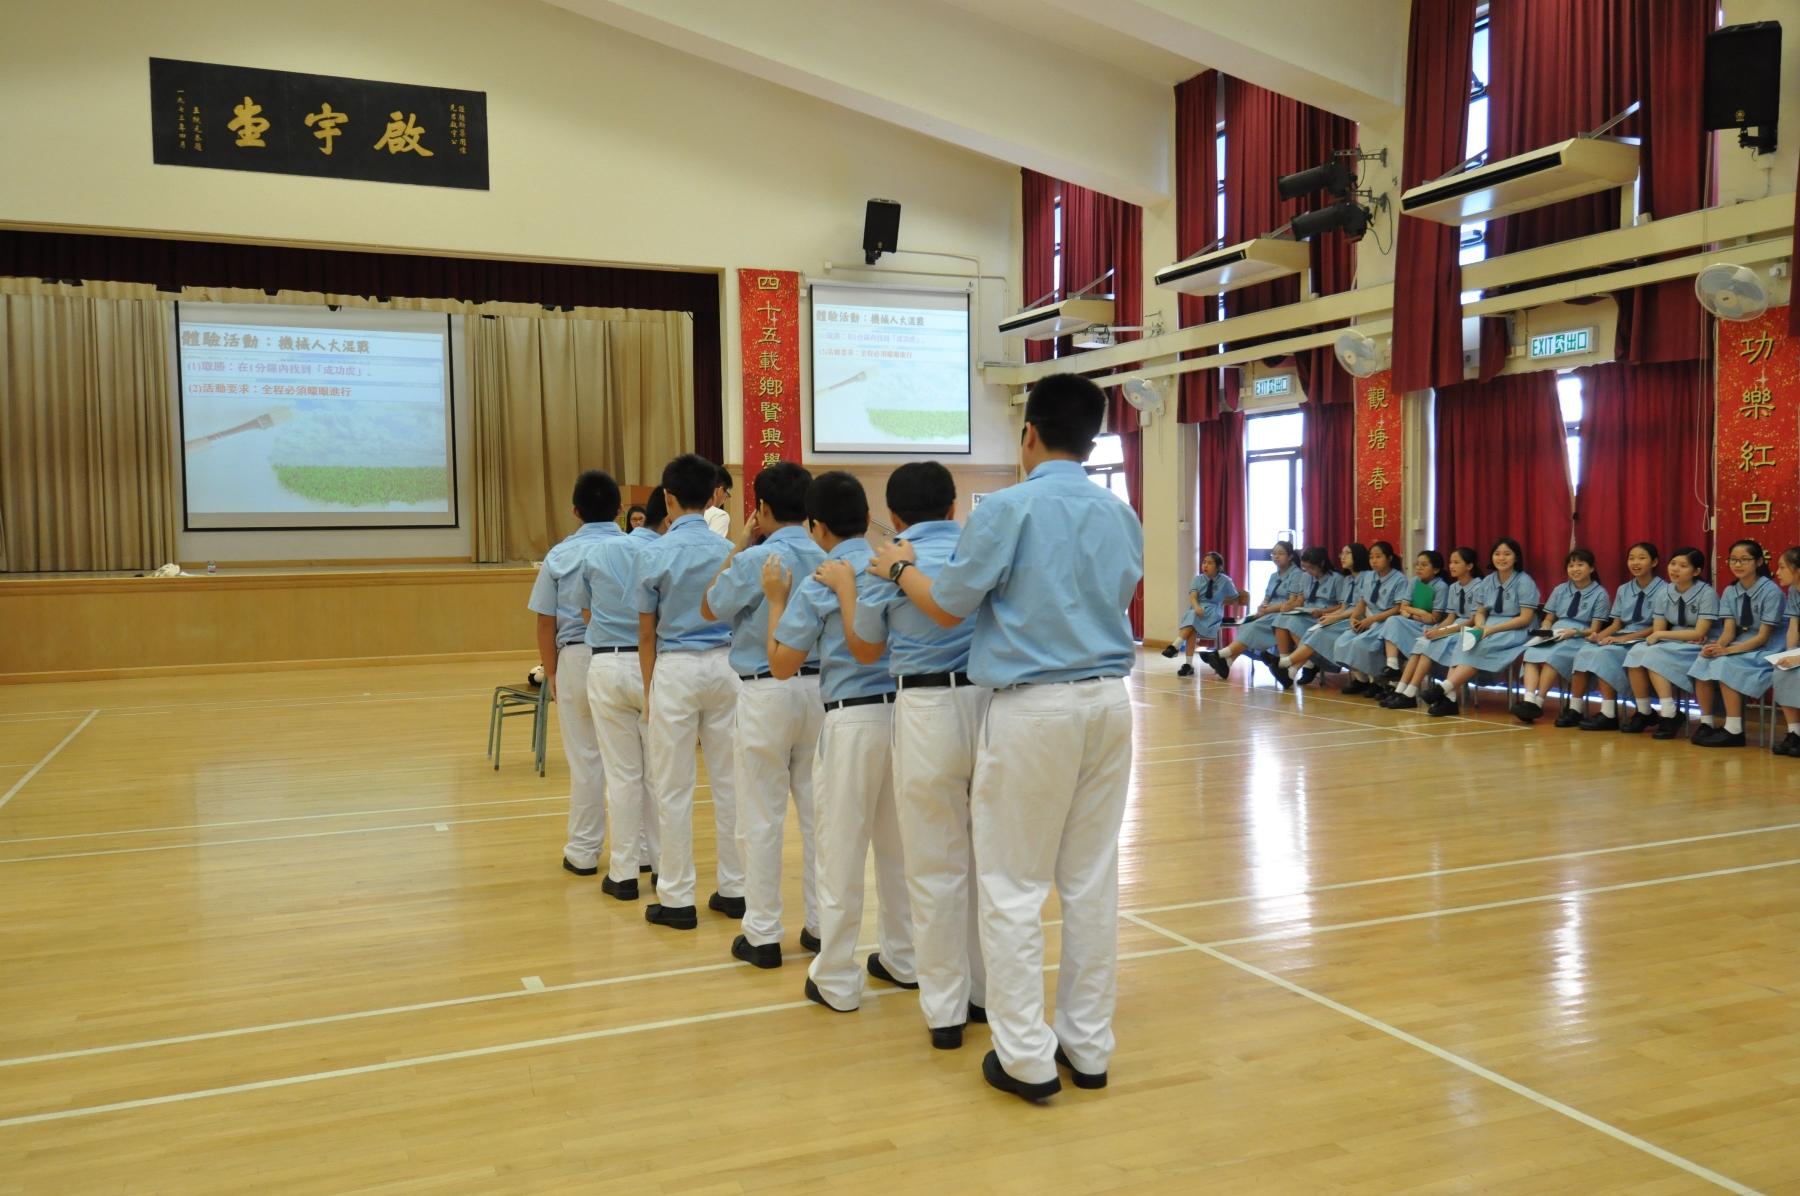 http://www.npc.edu.hk/sites/default/files/dsc_0242.jpg